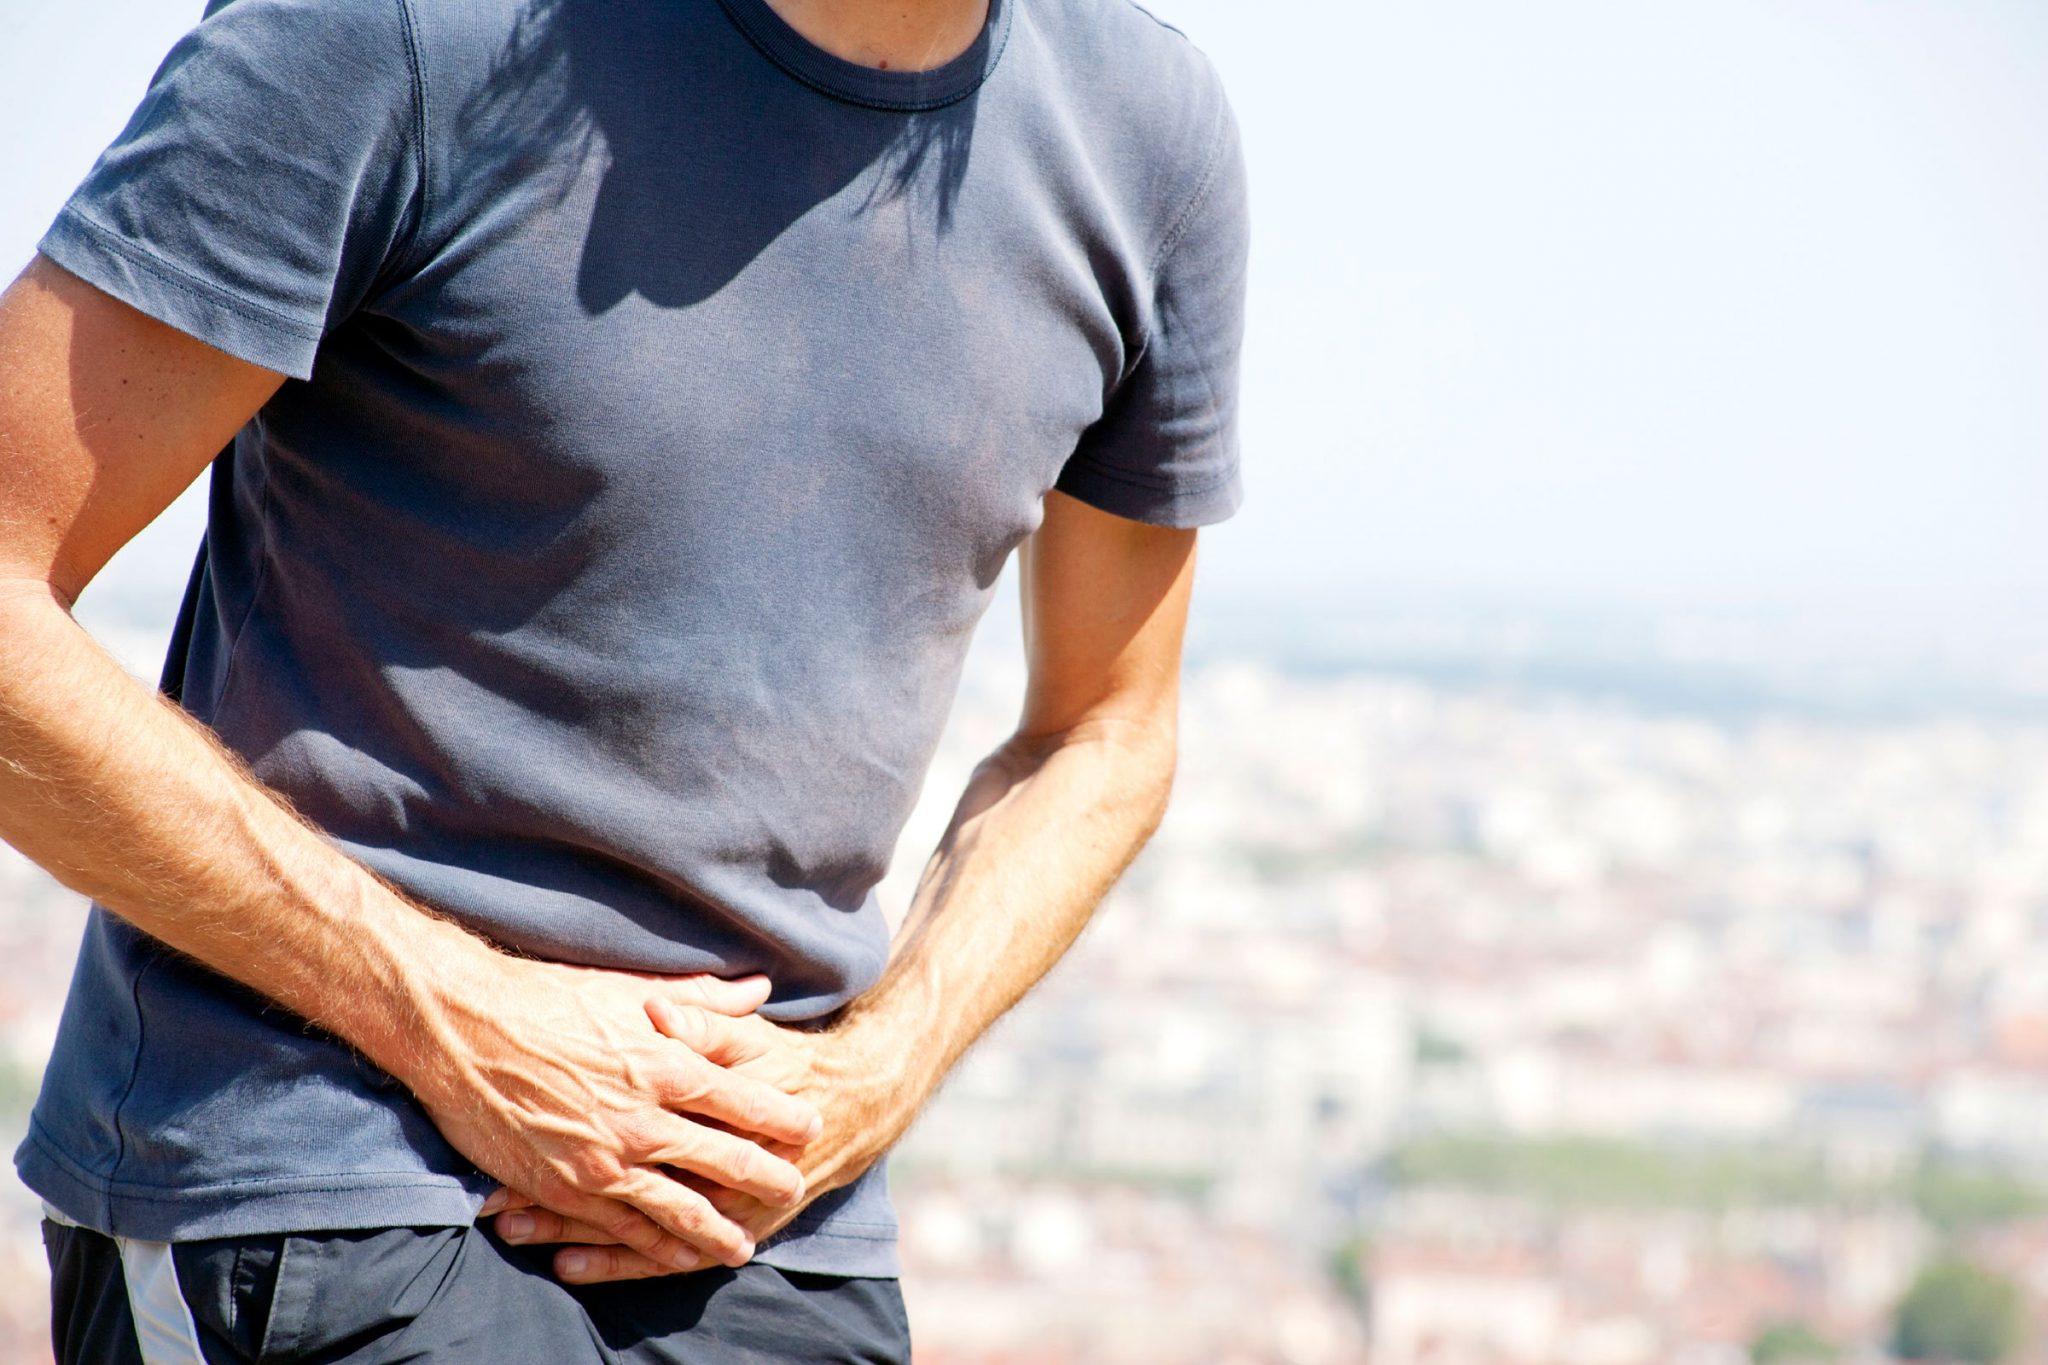 Guy holding stomach